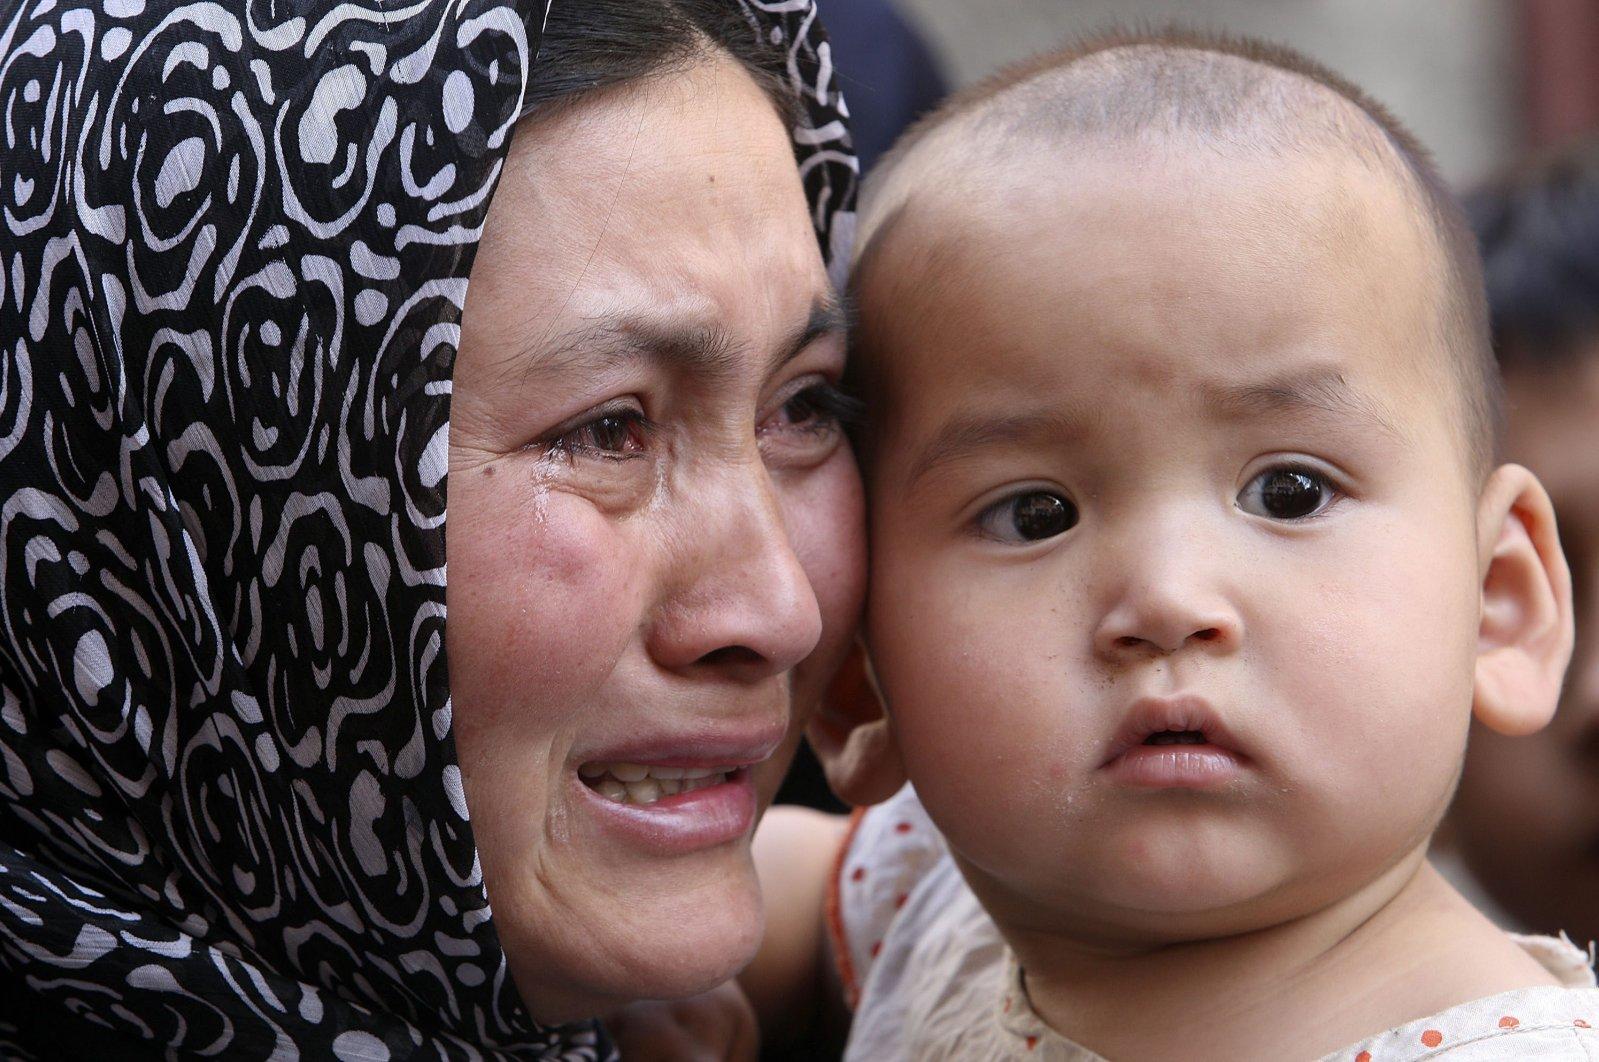 A Uighur woman cries as reporters visit a Uighur district that protested in Urumqi, Xinjiang Uighur Autonomous Region, western China, July 9, 2009. (AP Photo/Eugene Hoshiko)